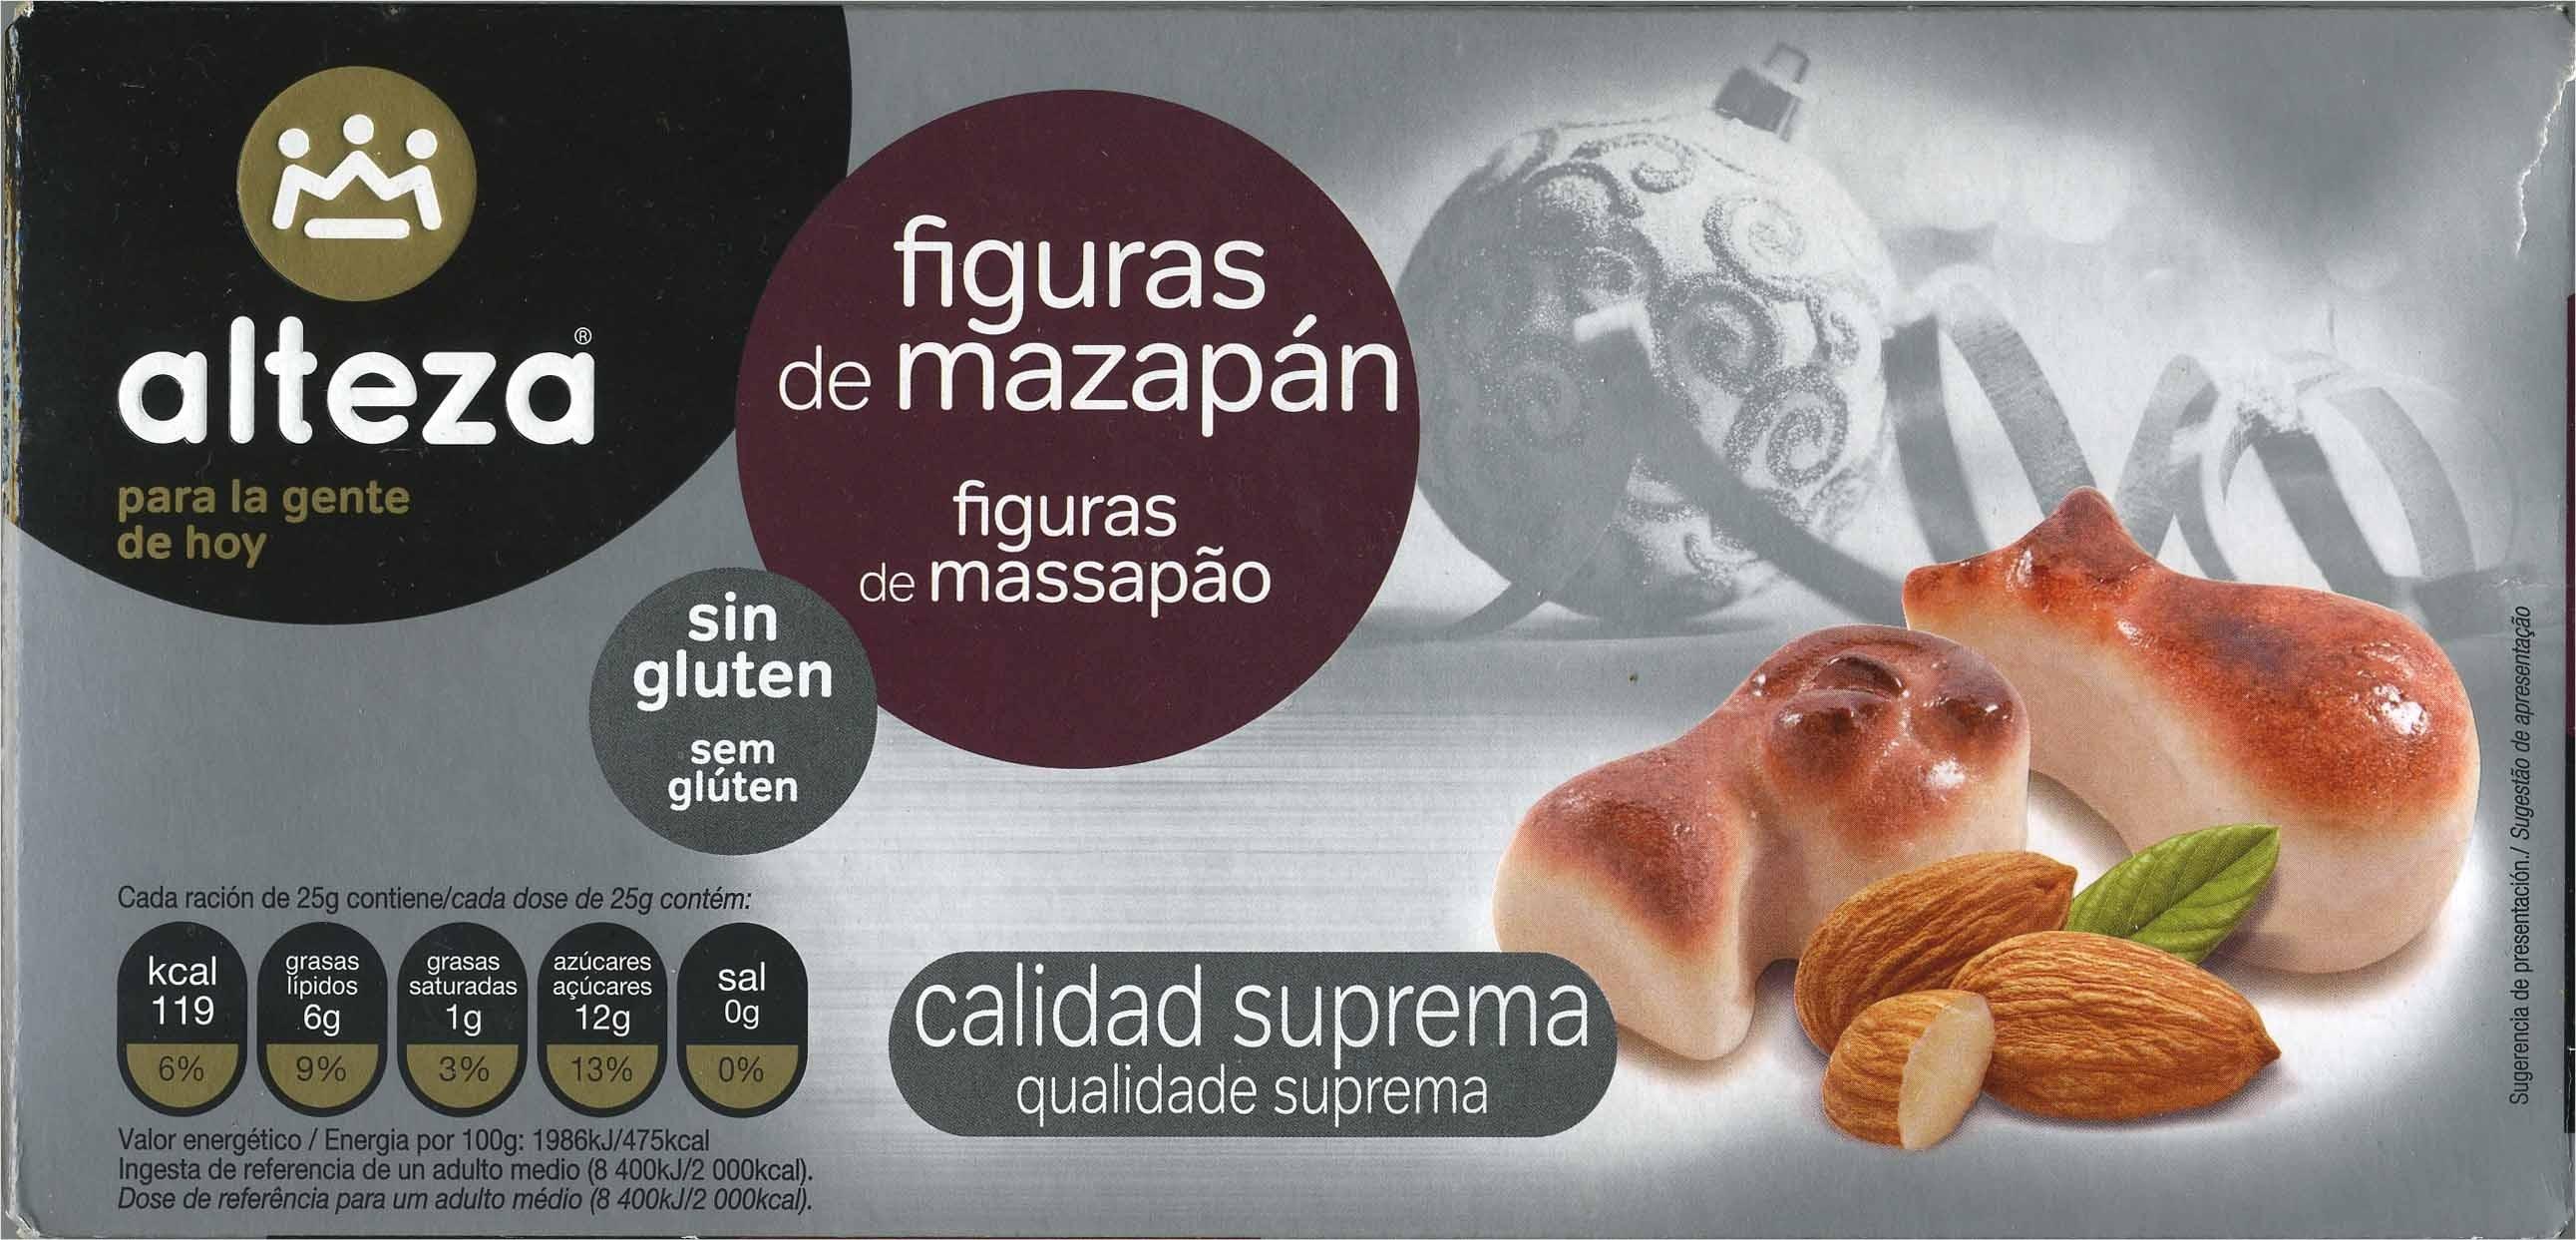 Figuras de mazapán - Product - es